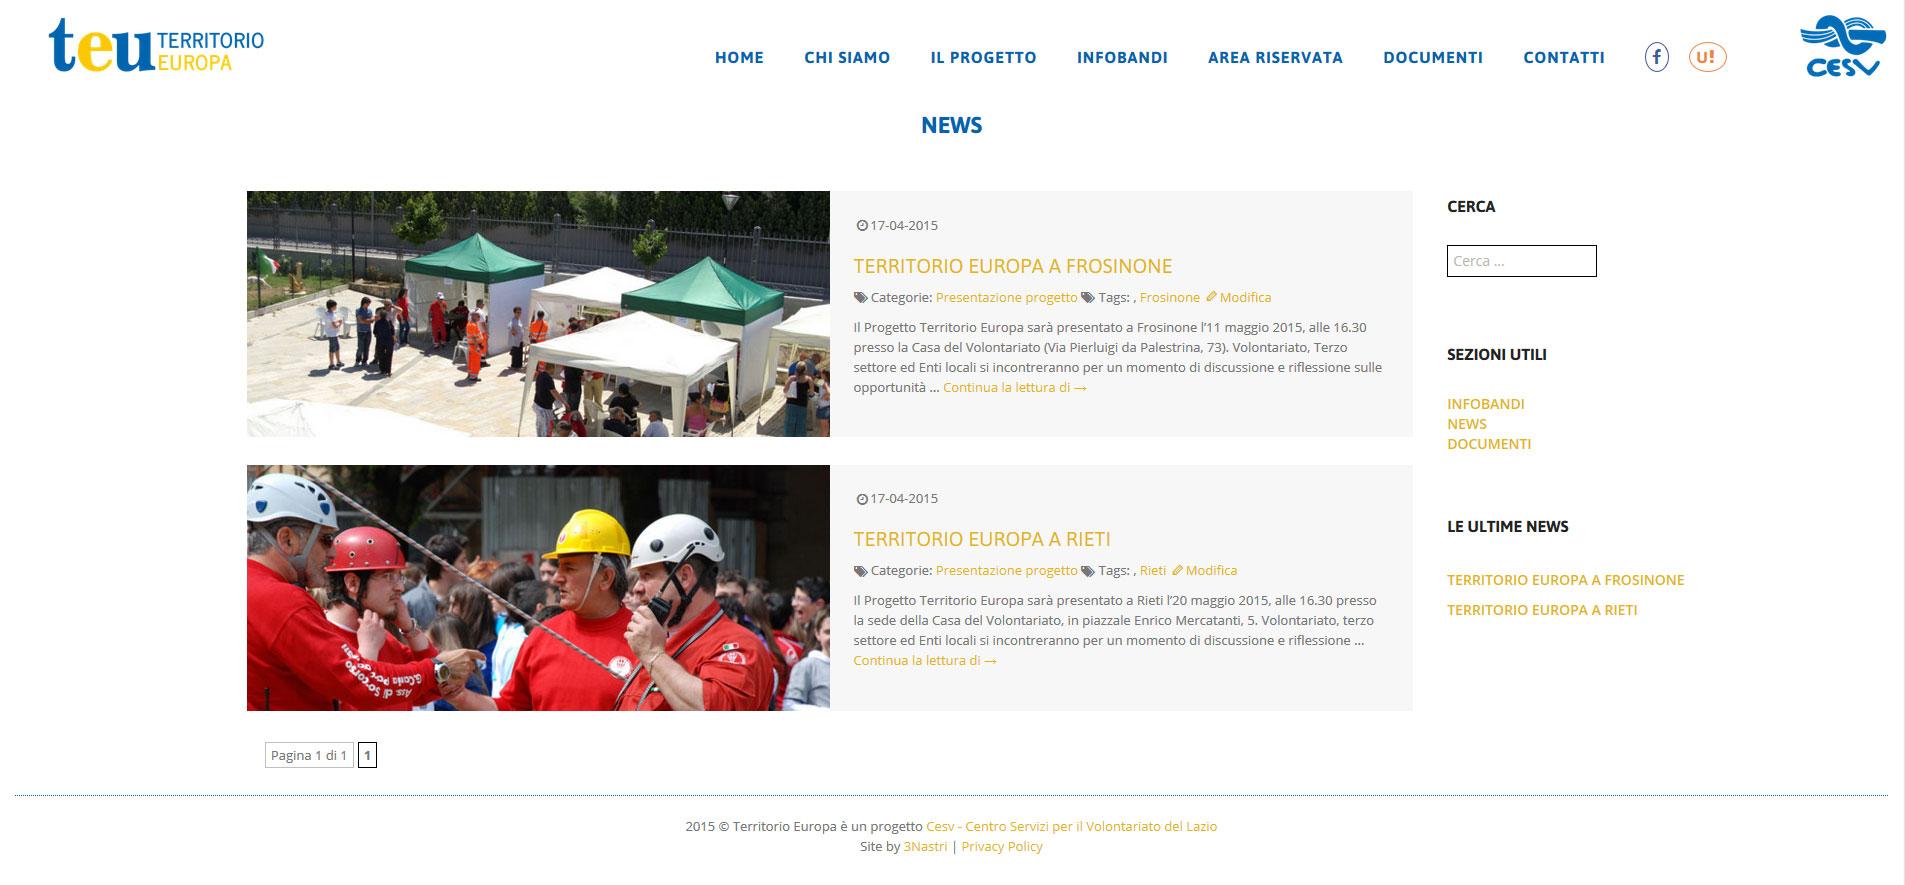 territorioeuropa-news